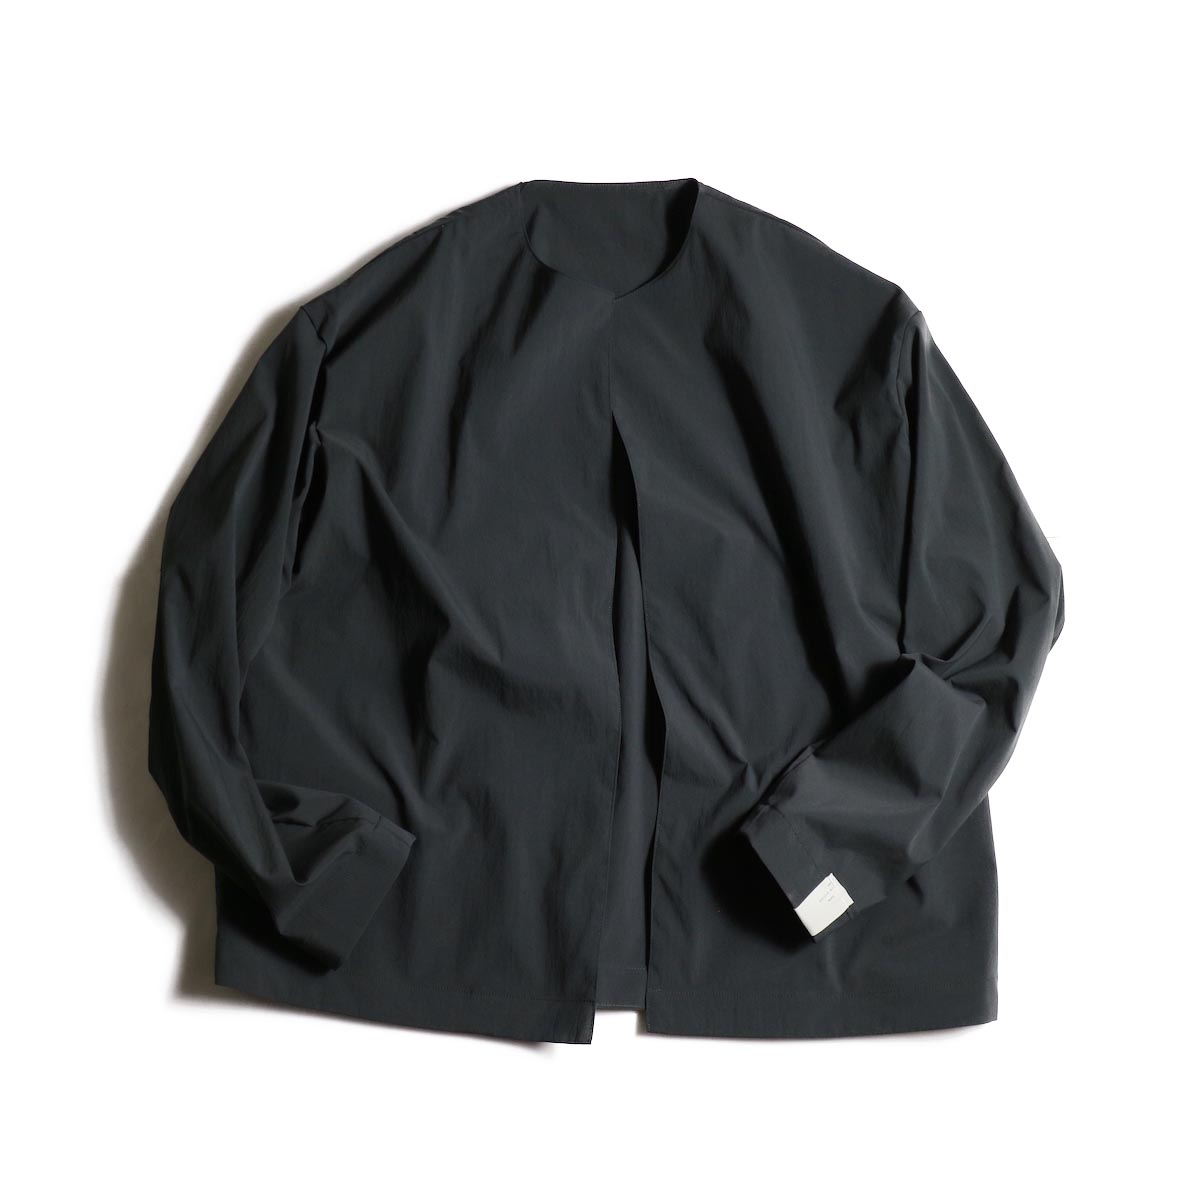 N.HOOLYWOOD / 1202-BL03-007 Collarless Jacket (Charcoal)